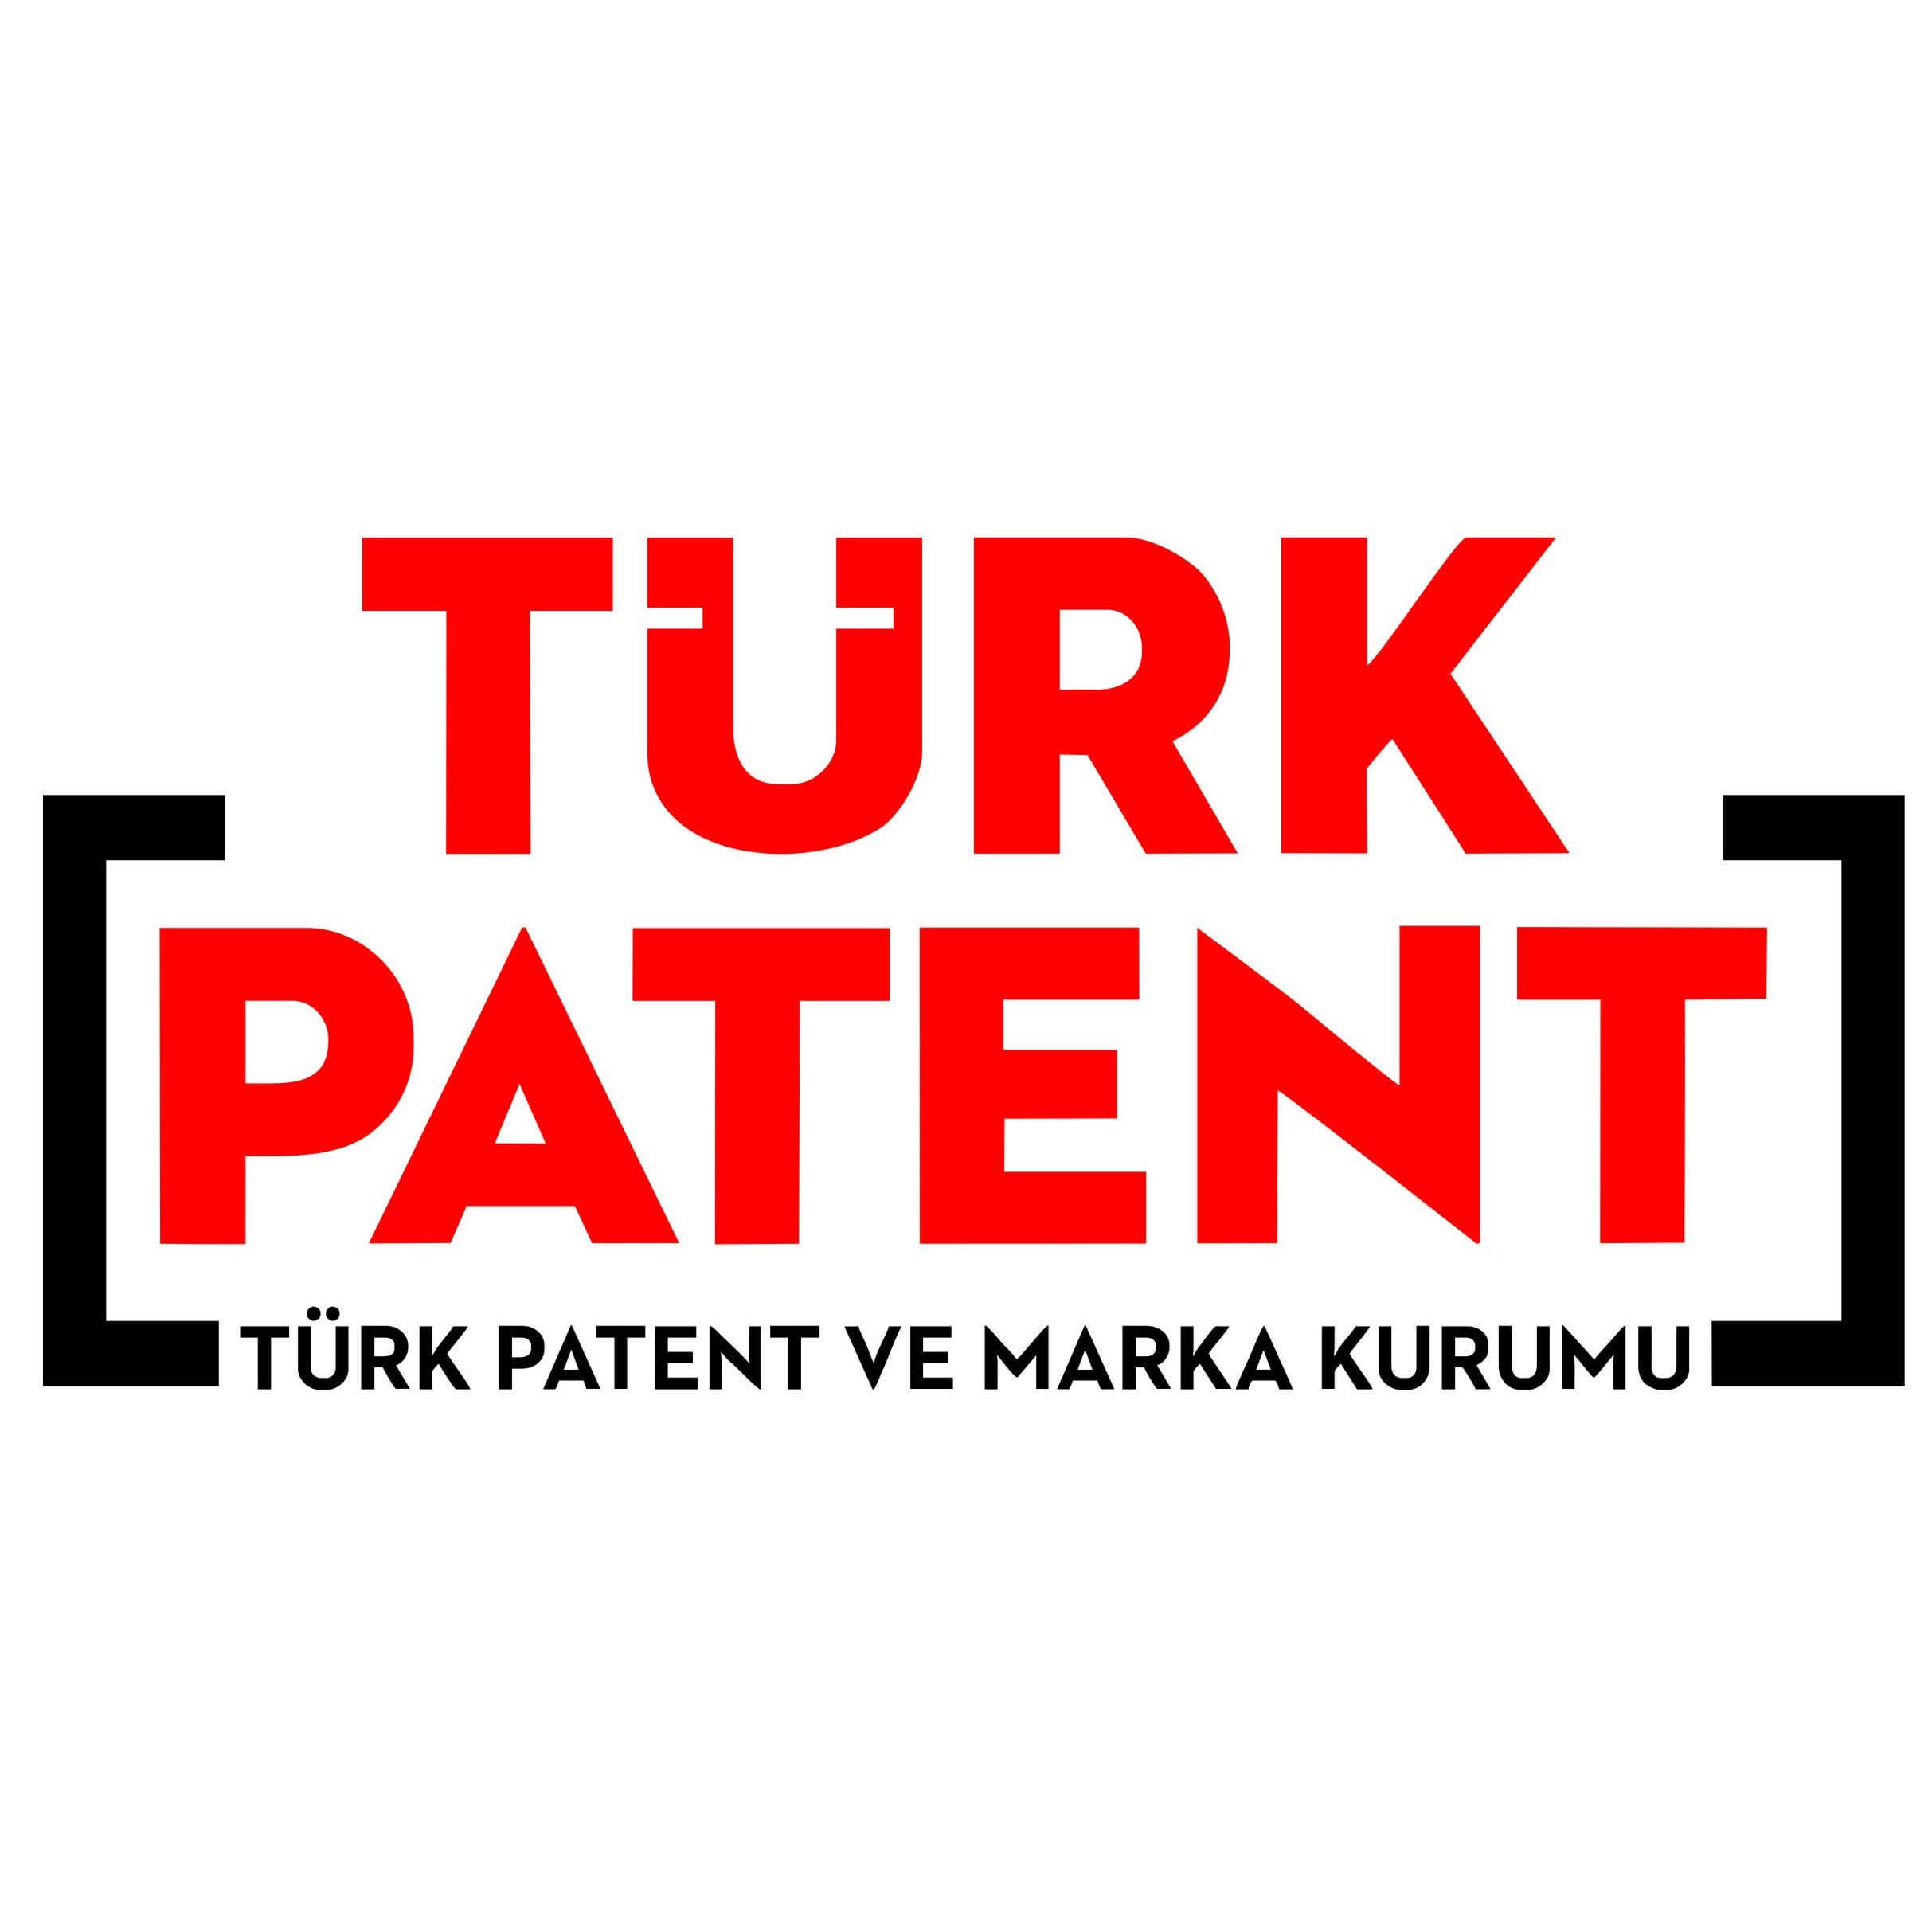 webfili-marka-ve-patent-başvurusu-hizmeti-alanya-01.jpg